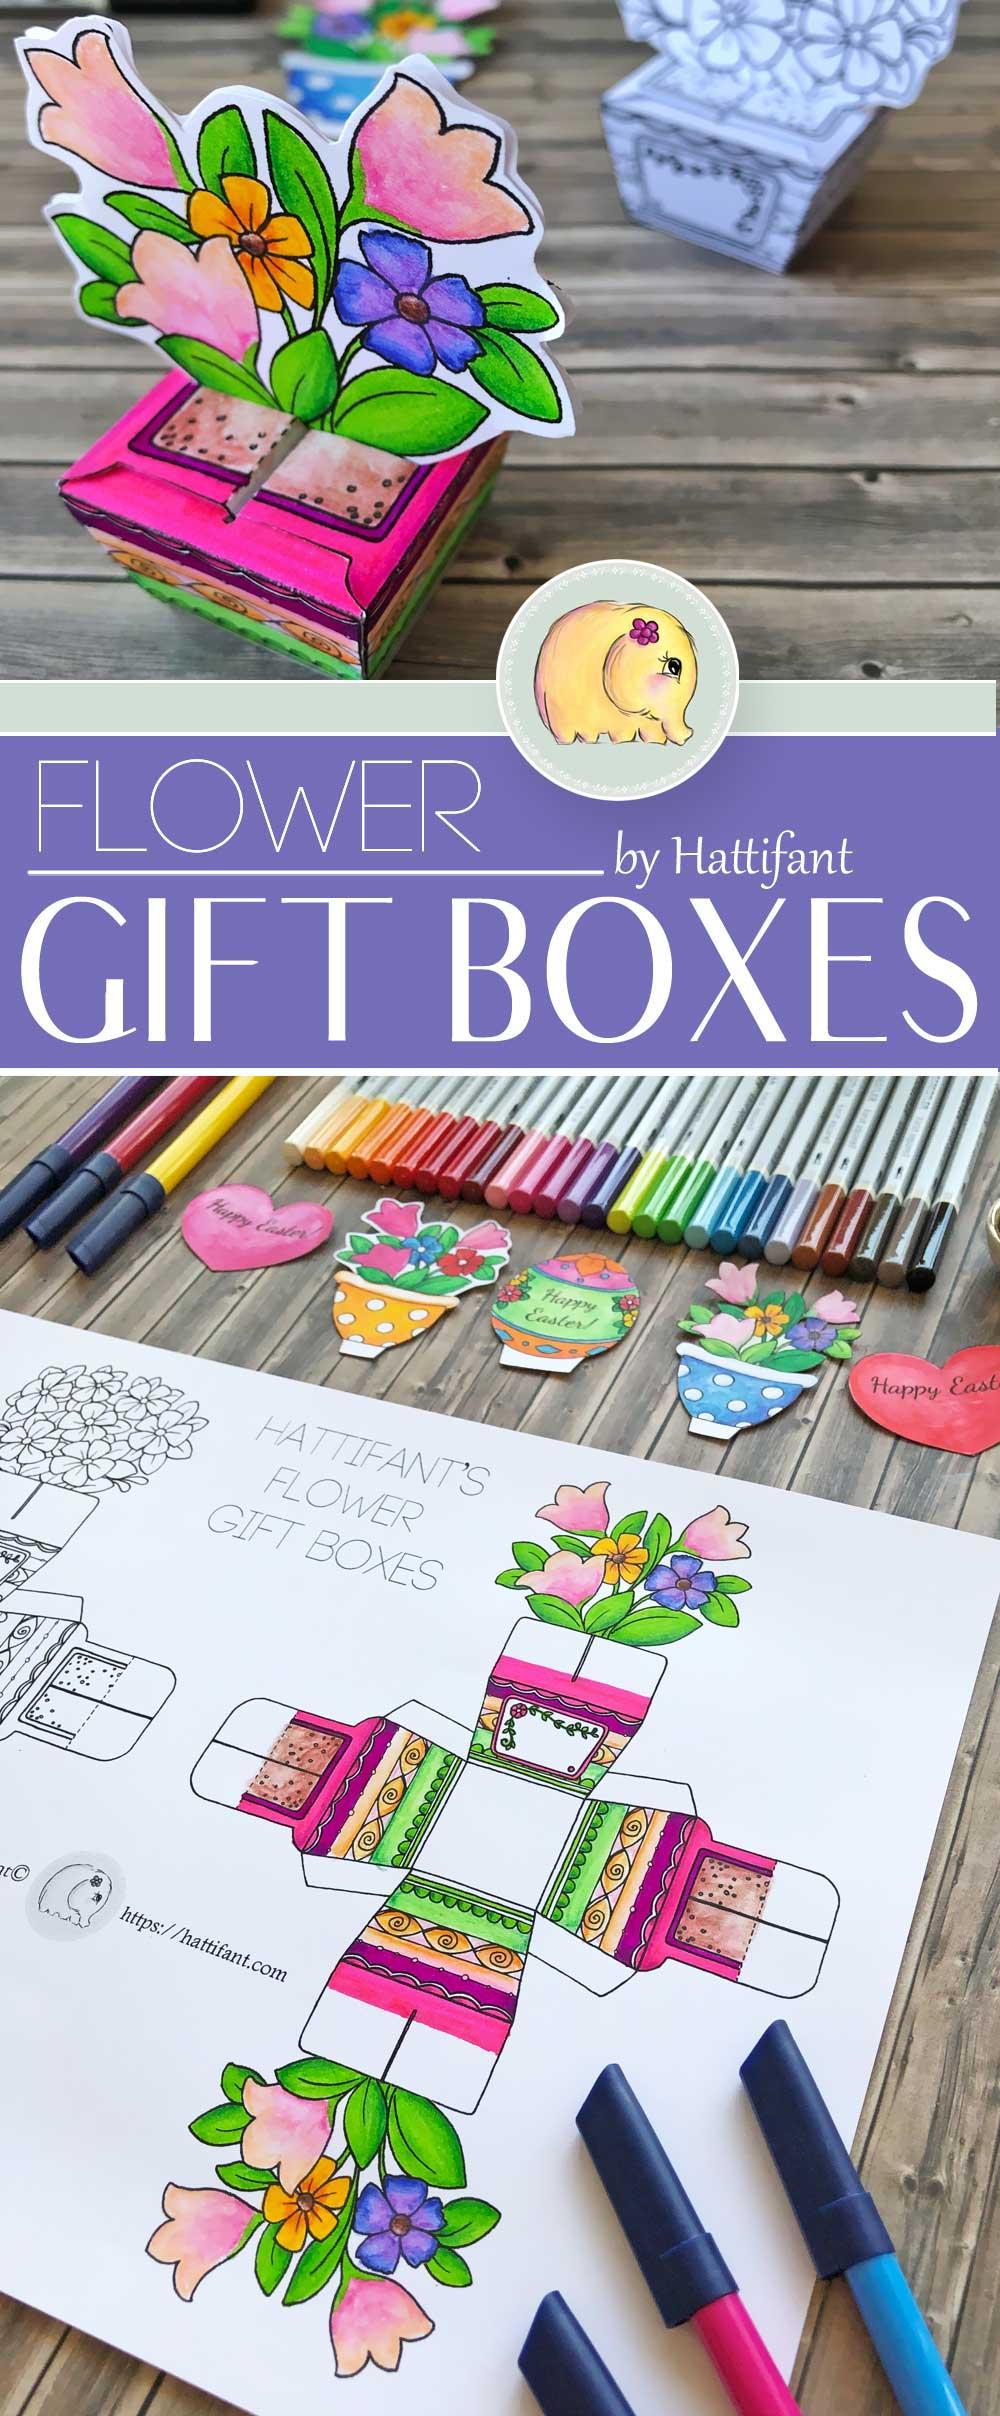 Hattifant's FLower Gift Boxes for Easter Bunny Shelf Sitters